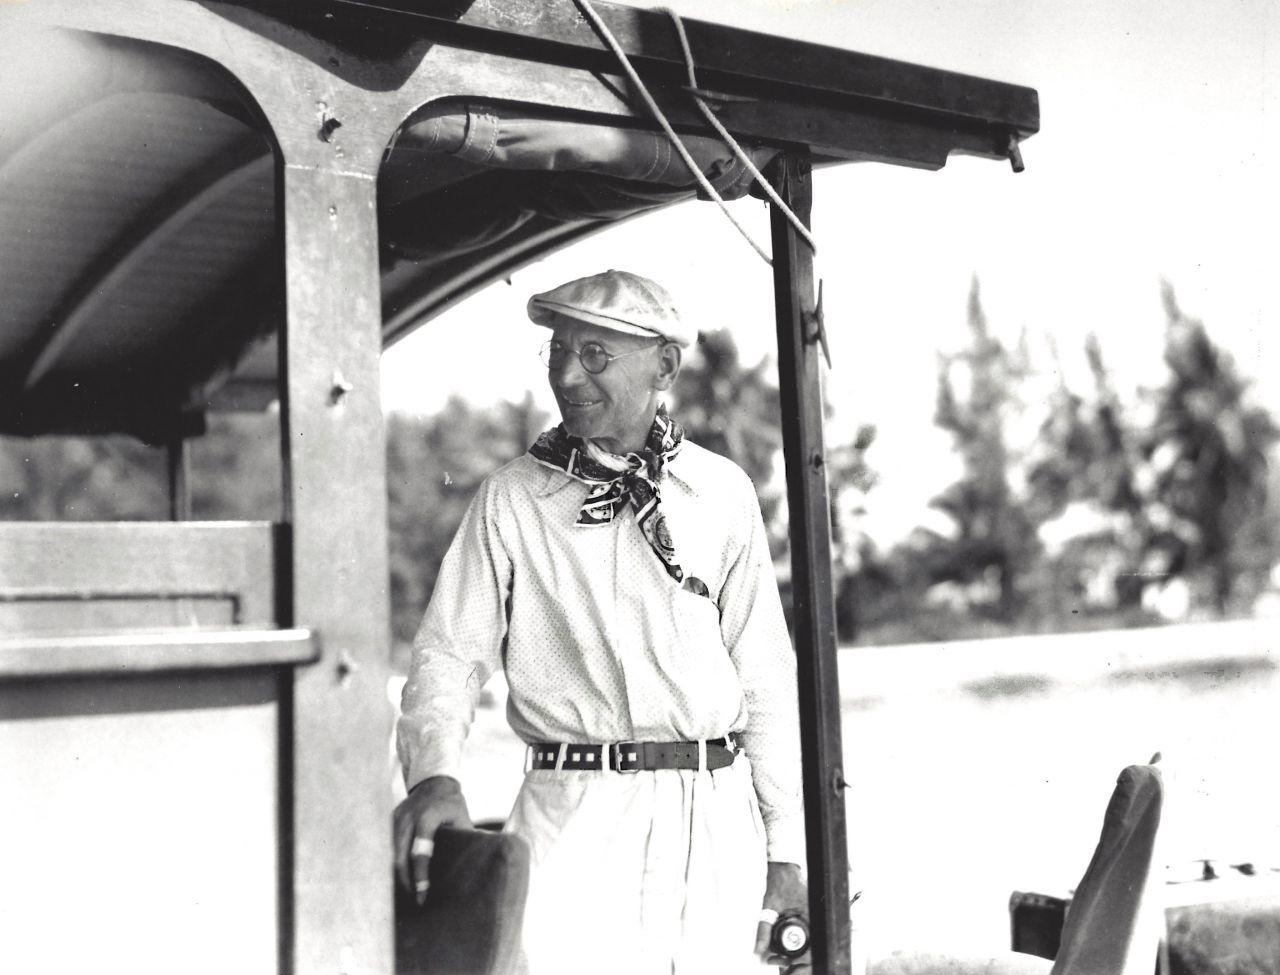 Gus Pfeiffer aboard Ernest Hemingway's boat Pilar, courtesy of the John F. Kennedy Library.